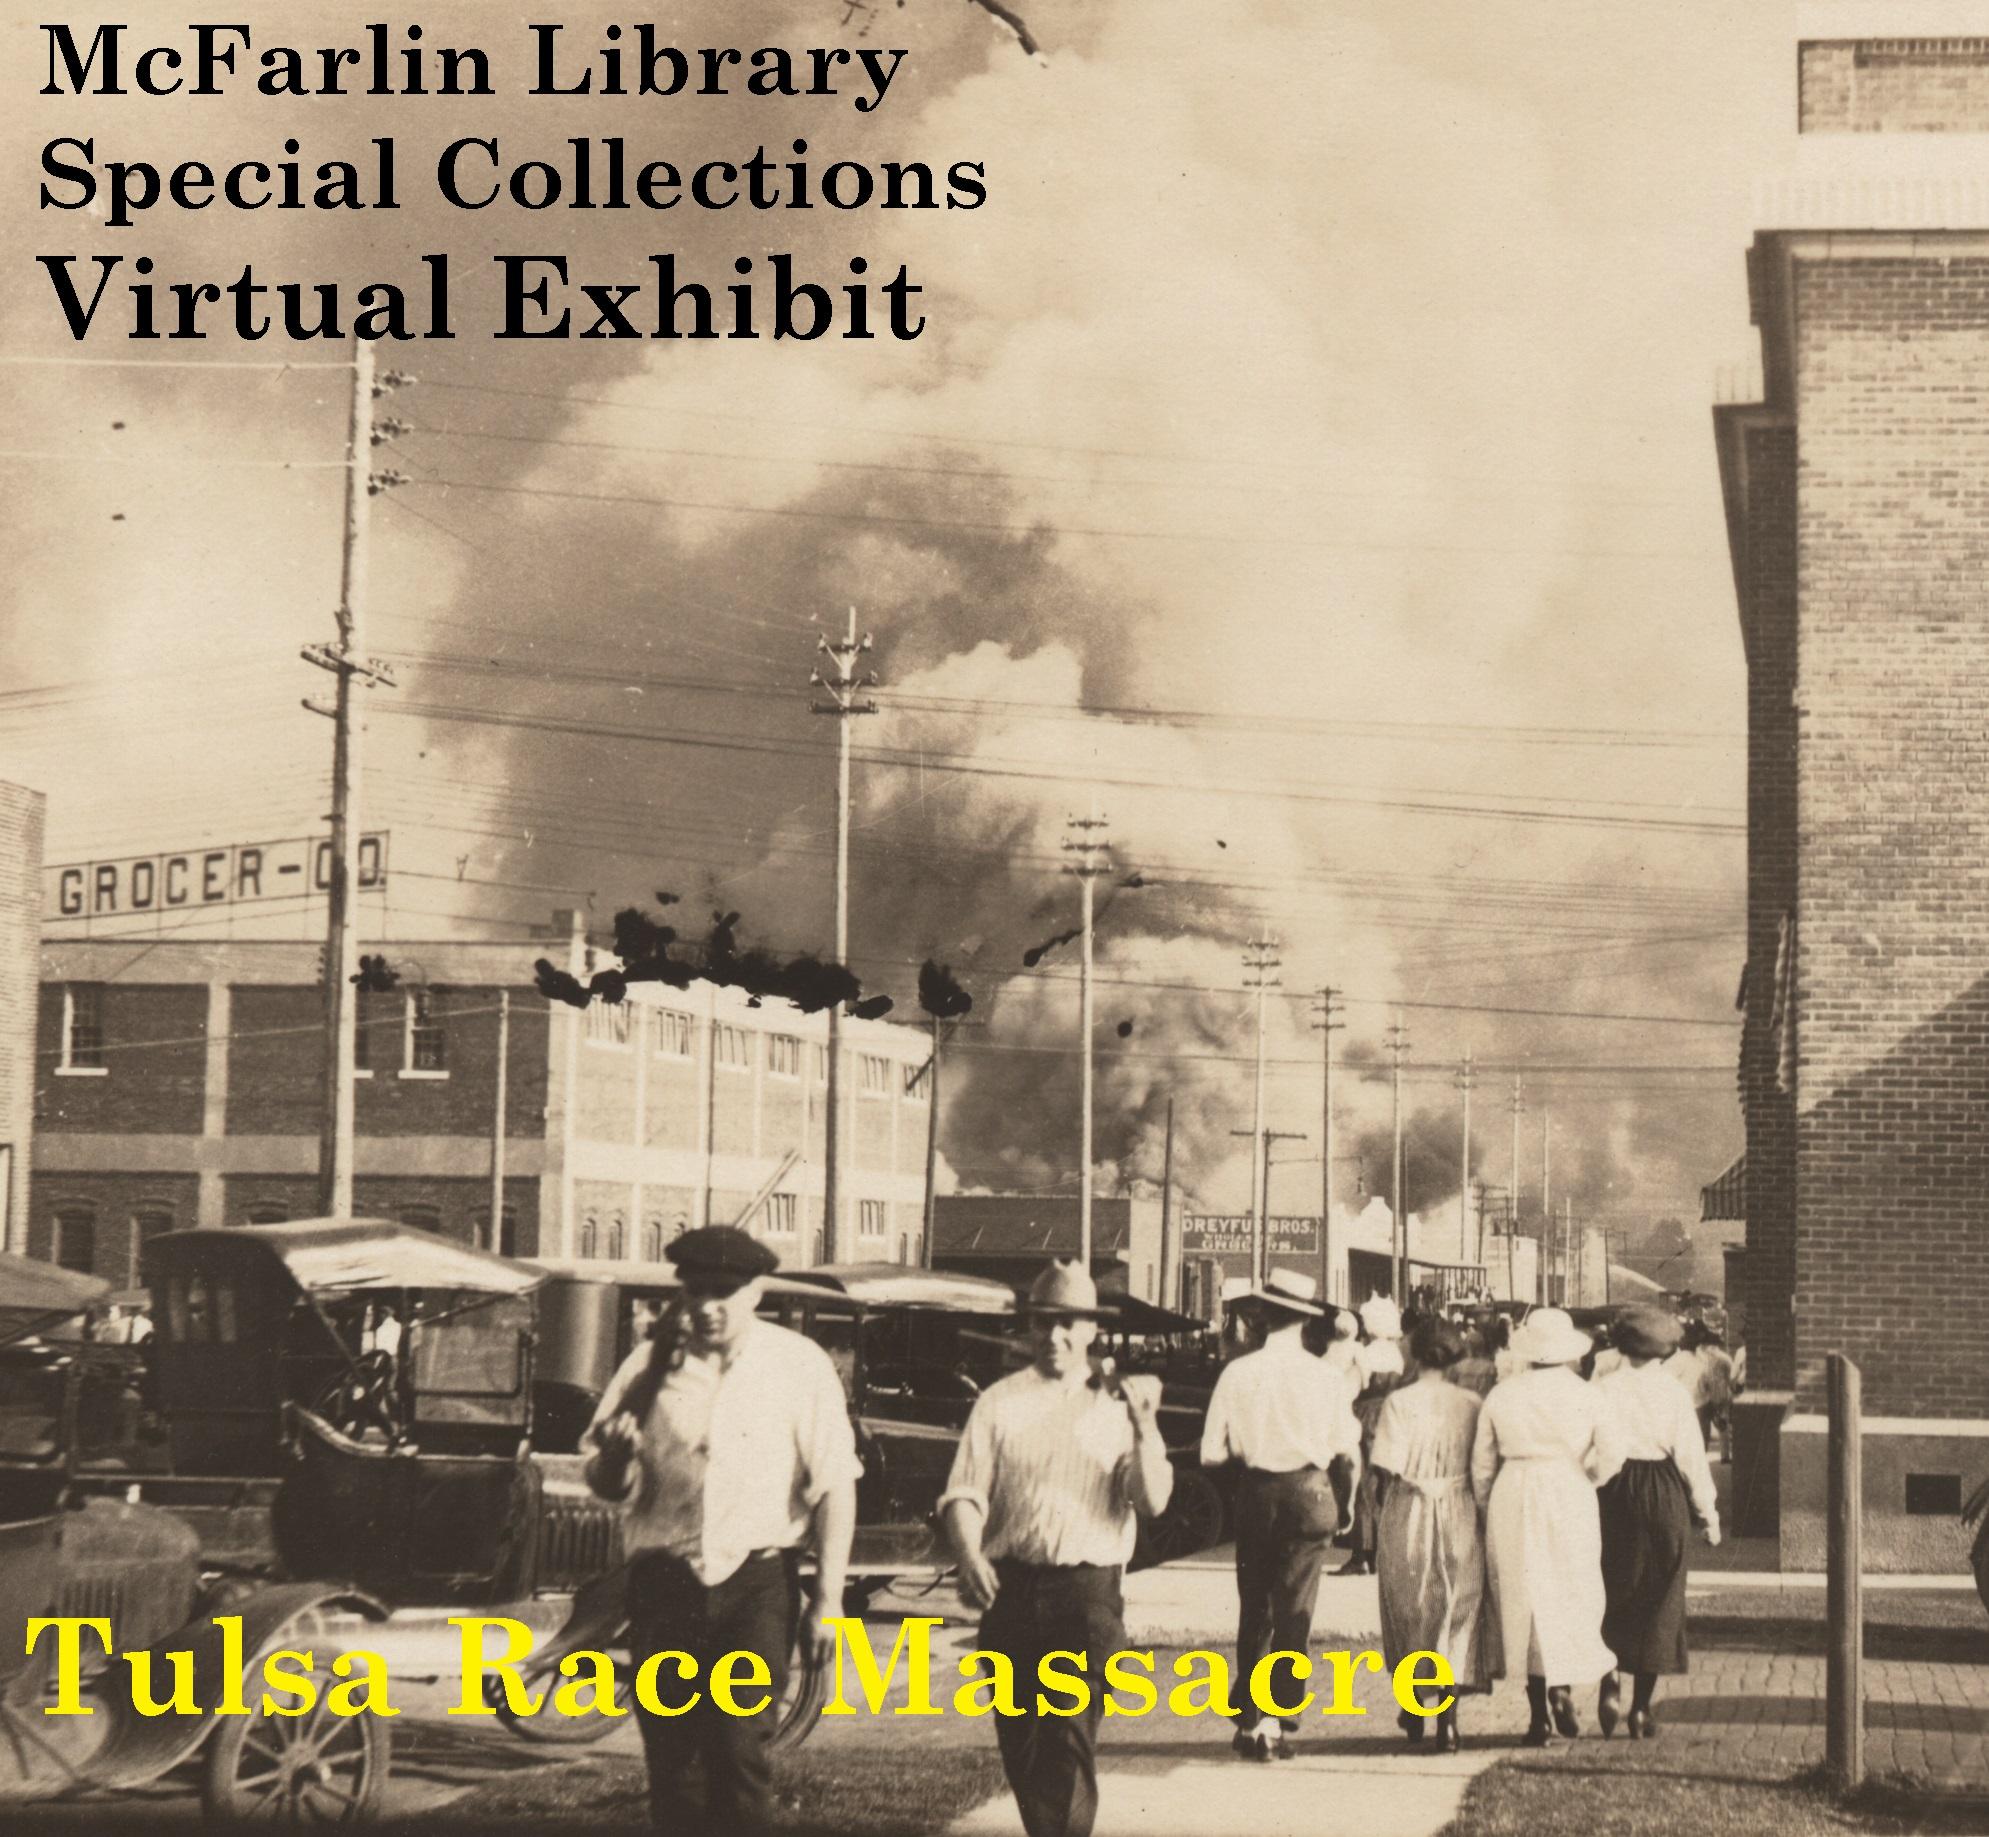 Special Collections' Virtual Tulsa Massacre Exhibit